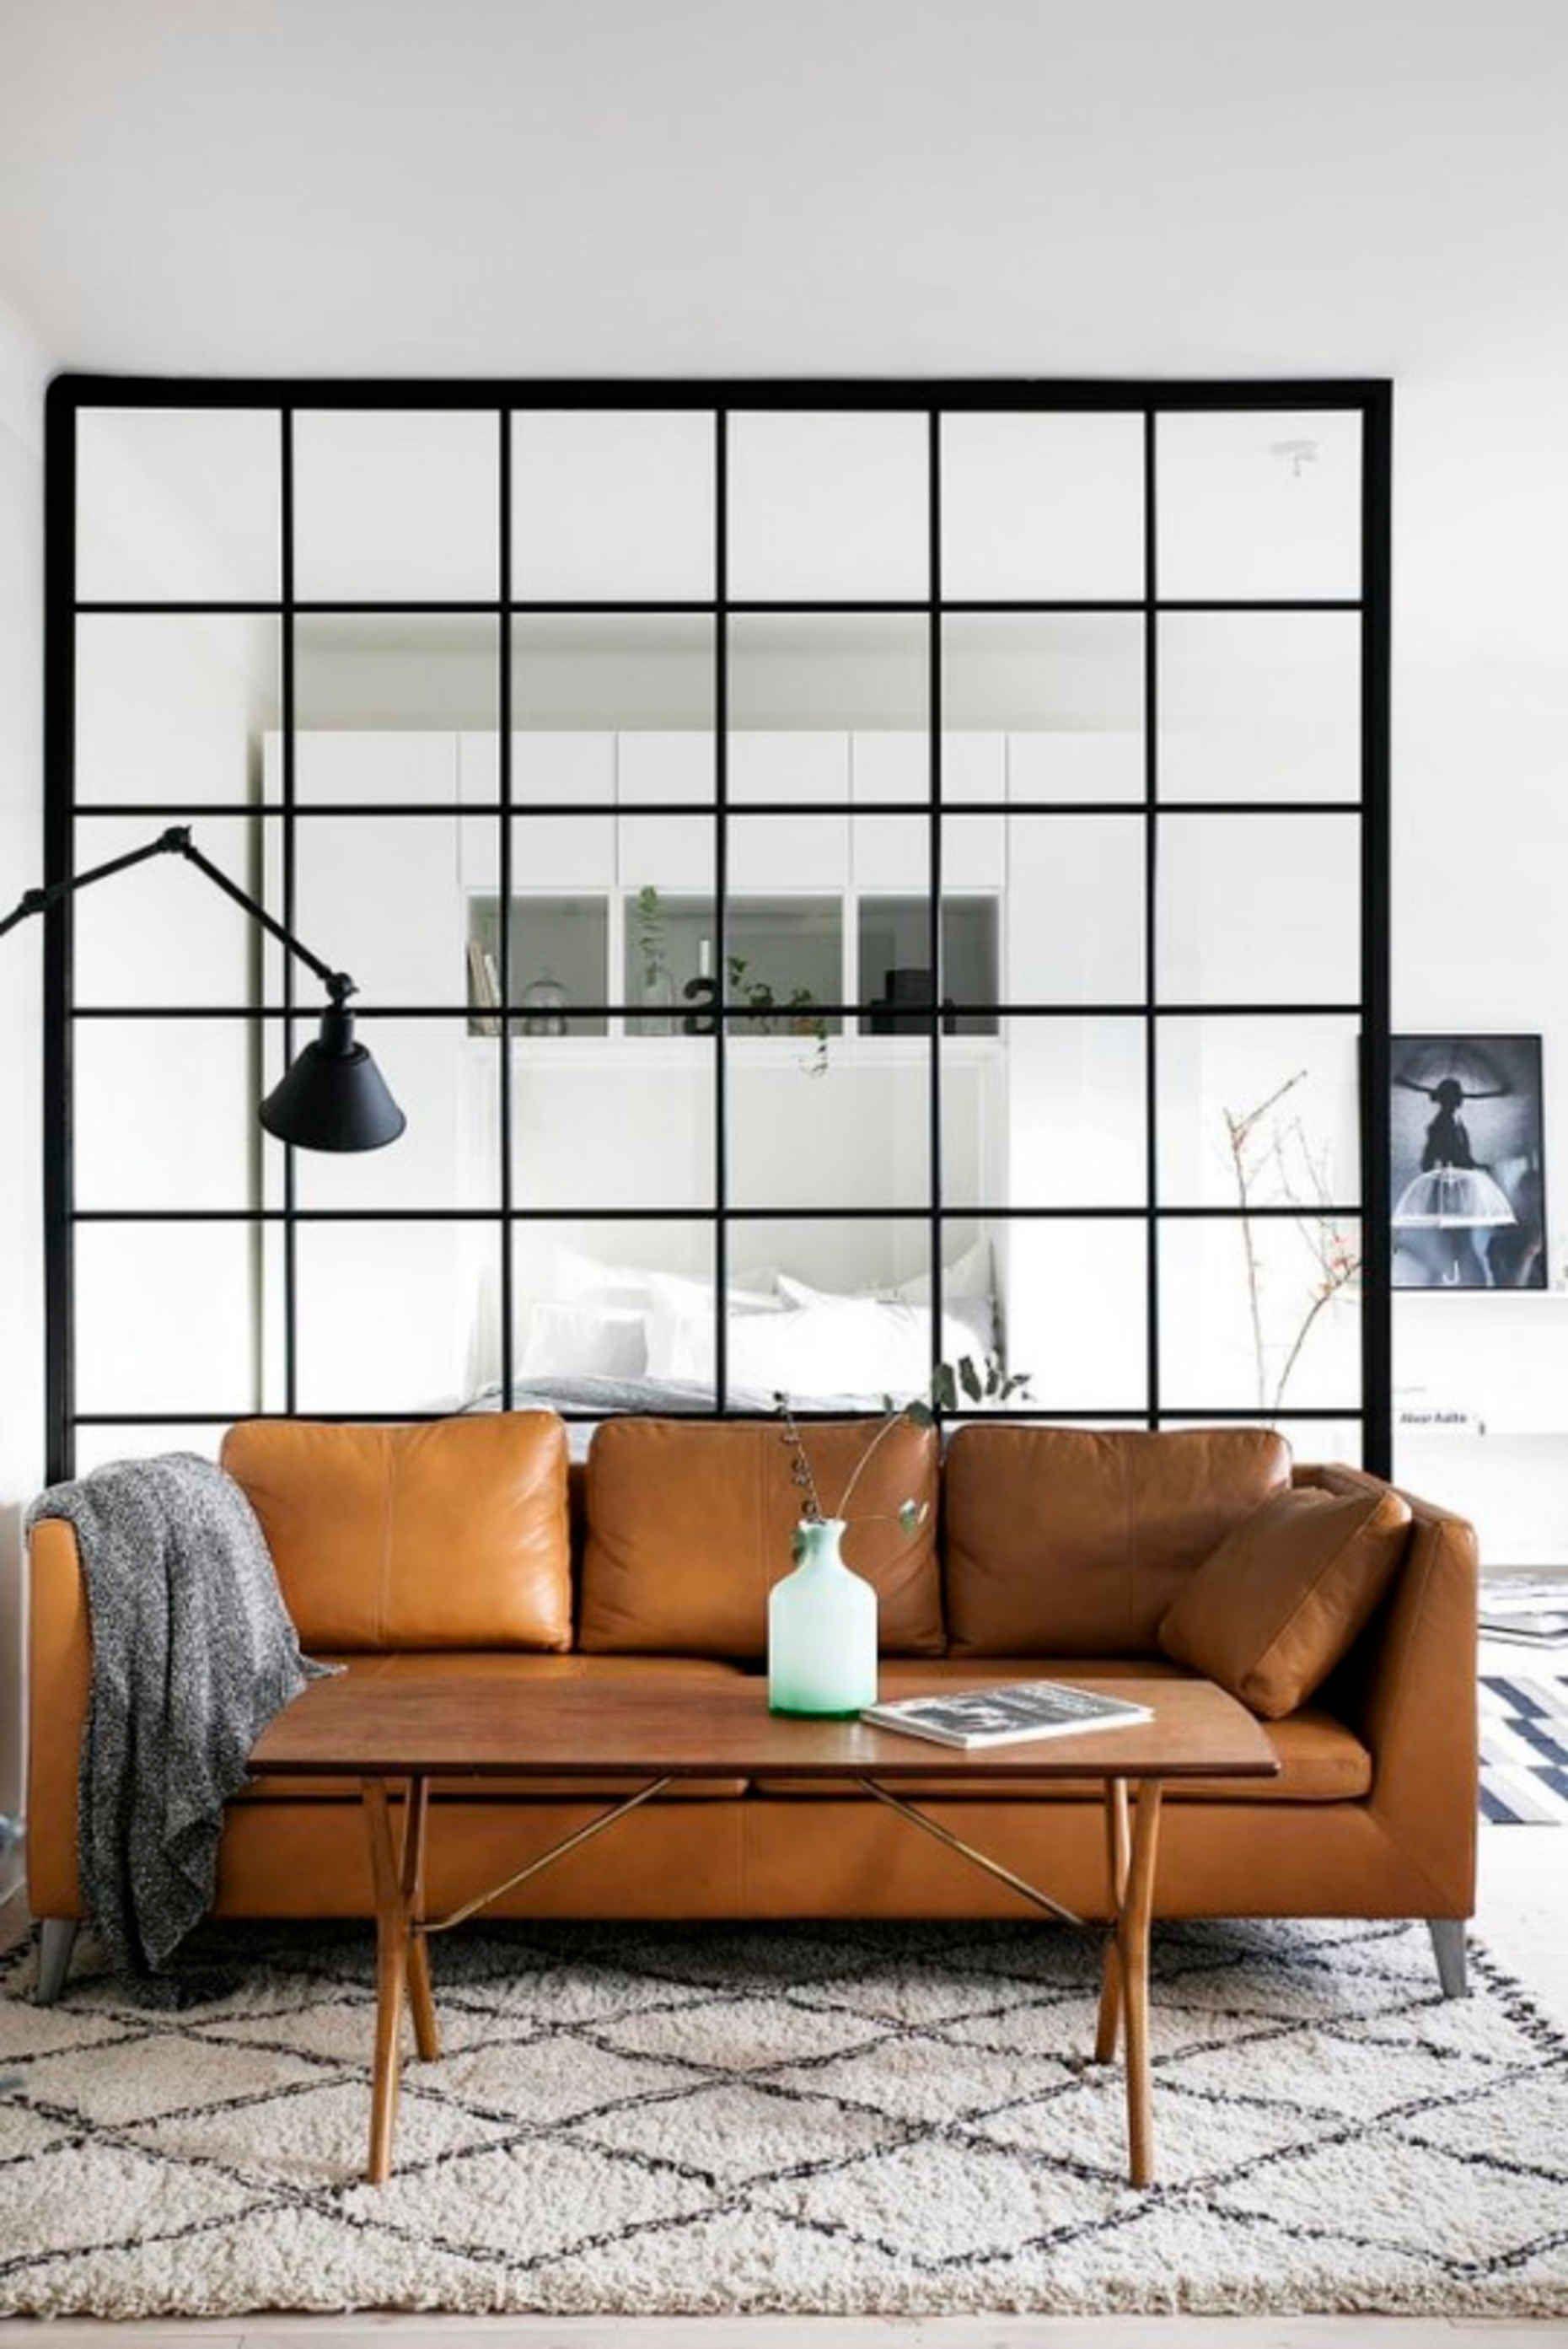 Minimal Interior Design Inspiration | Divider, Interior design ...